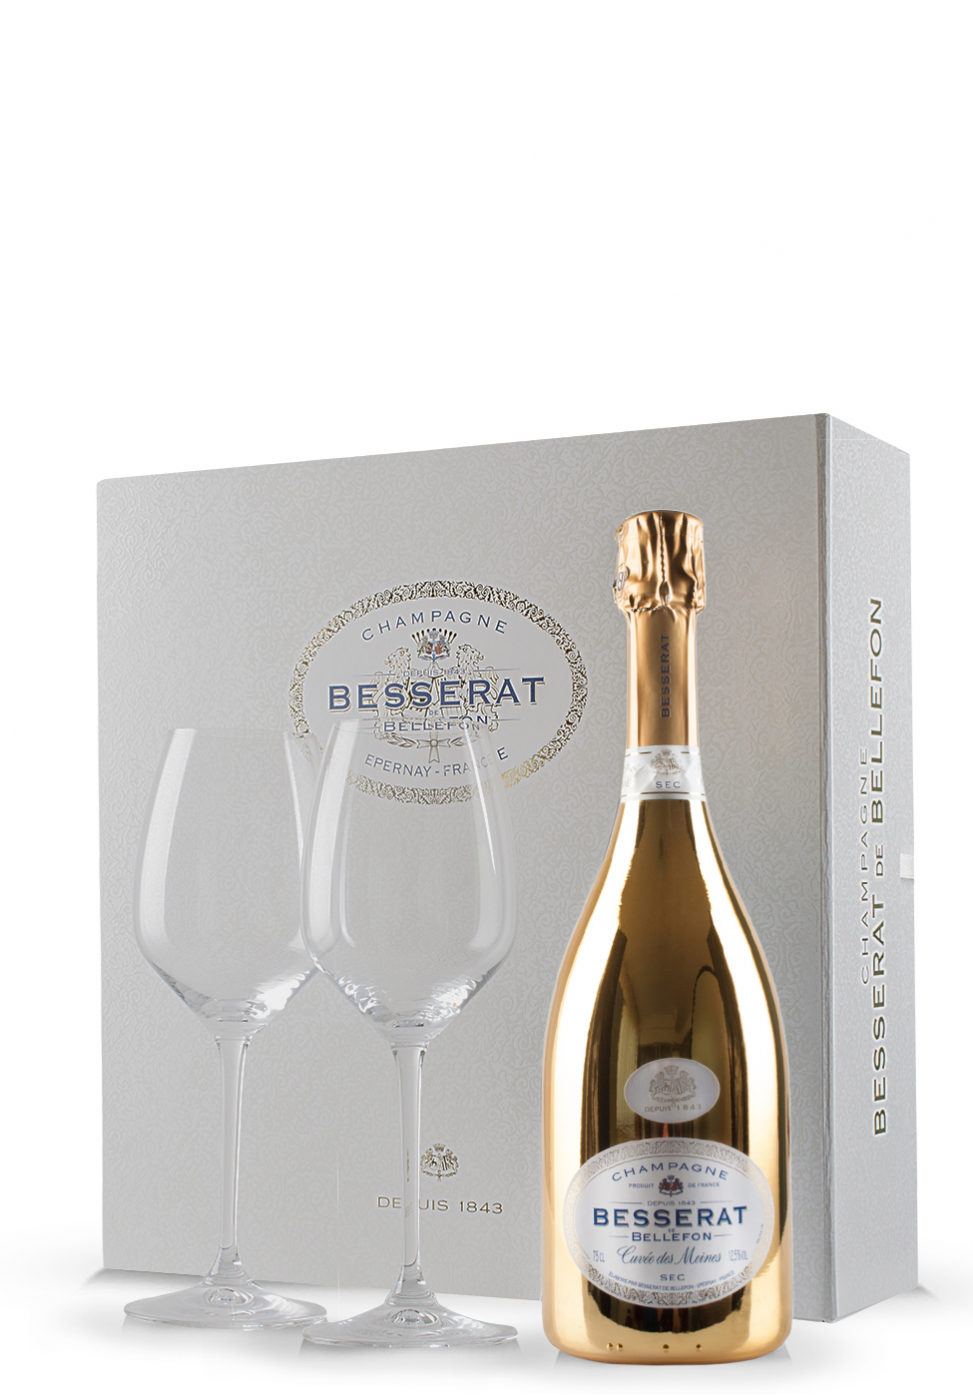 Set cadou Şampanie Besserat de Bellefon Sec (0.75L) + Cutie cadou cu 2 pahare Riedel